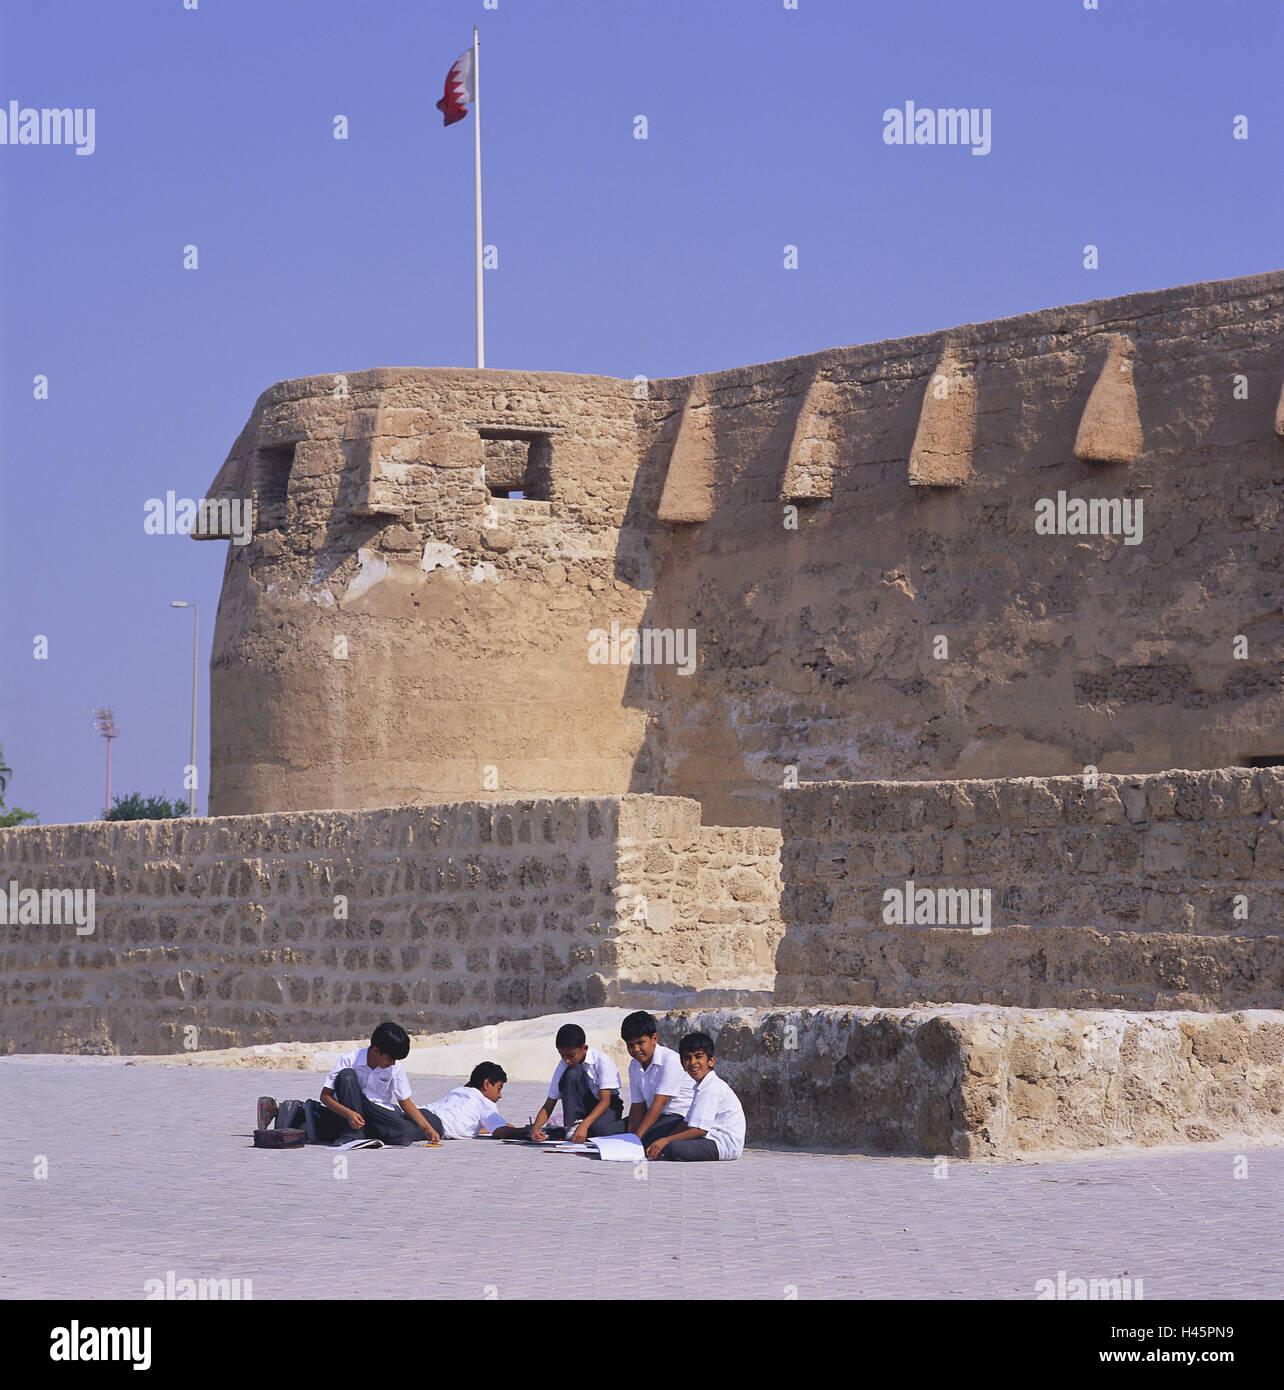 Bahrain, island Muharraq, fortress, Qala'at Arad, children, no model release, island state, sheikdom, destination, - Stock Image